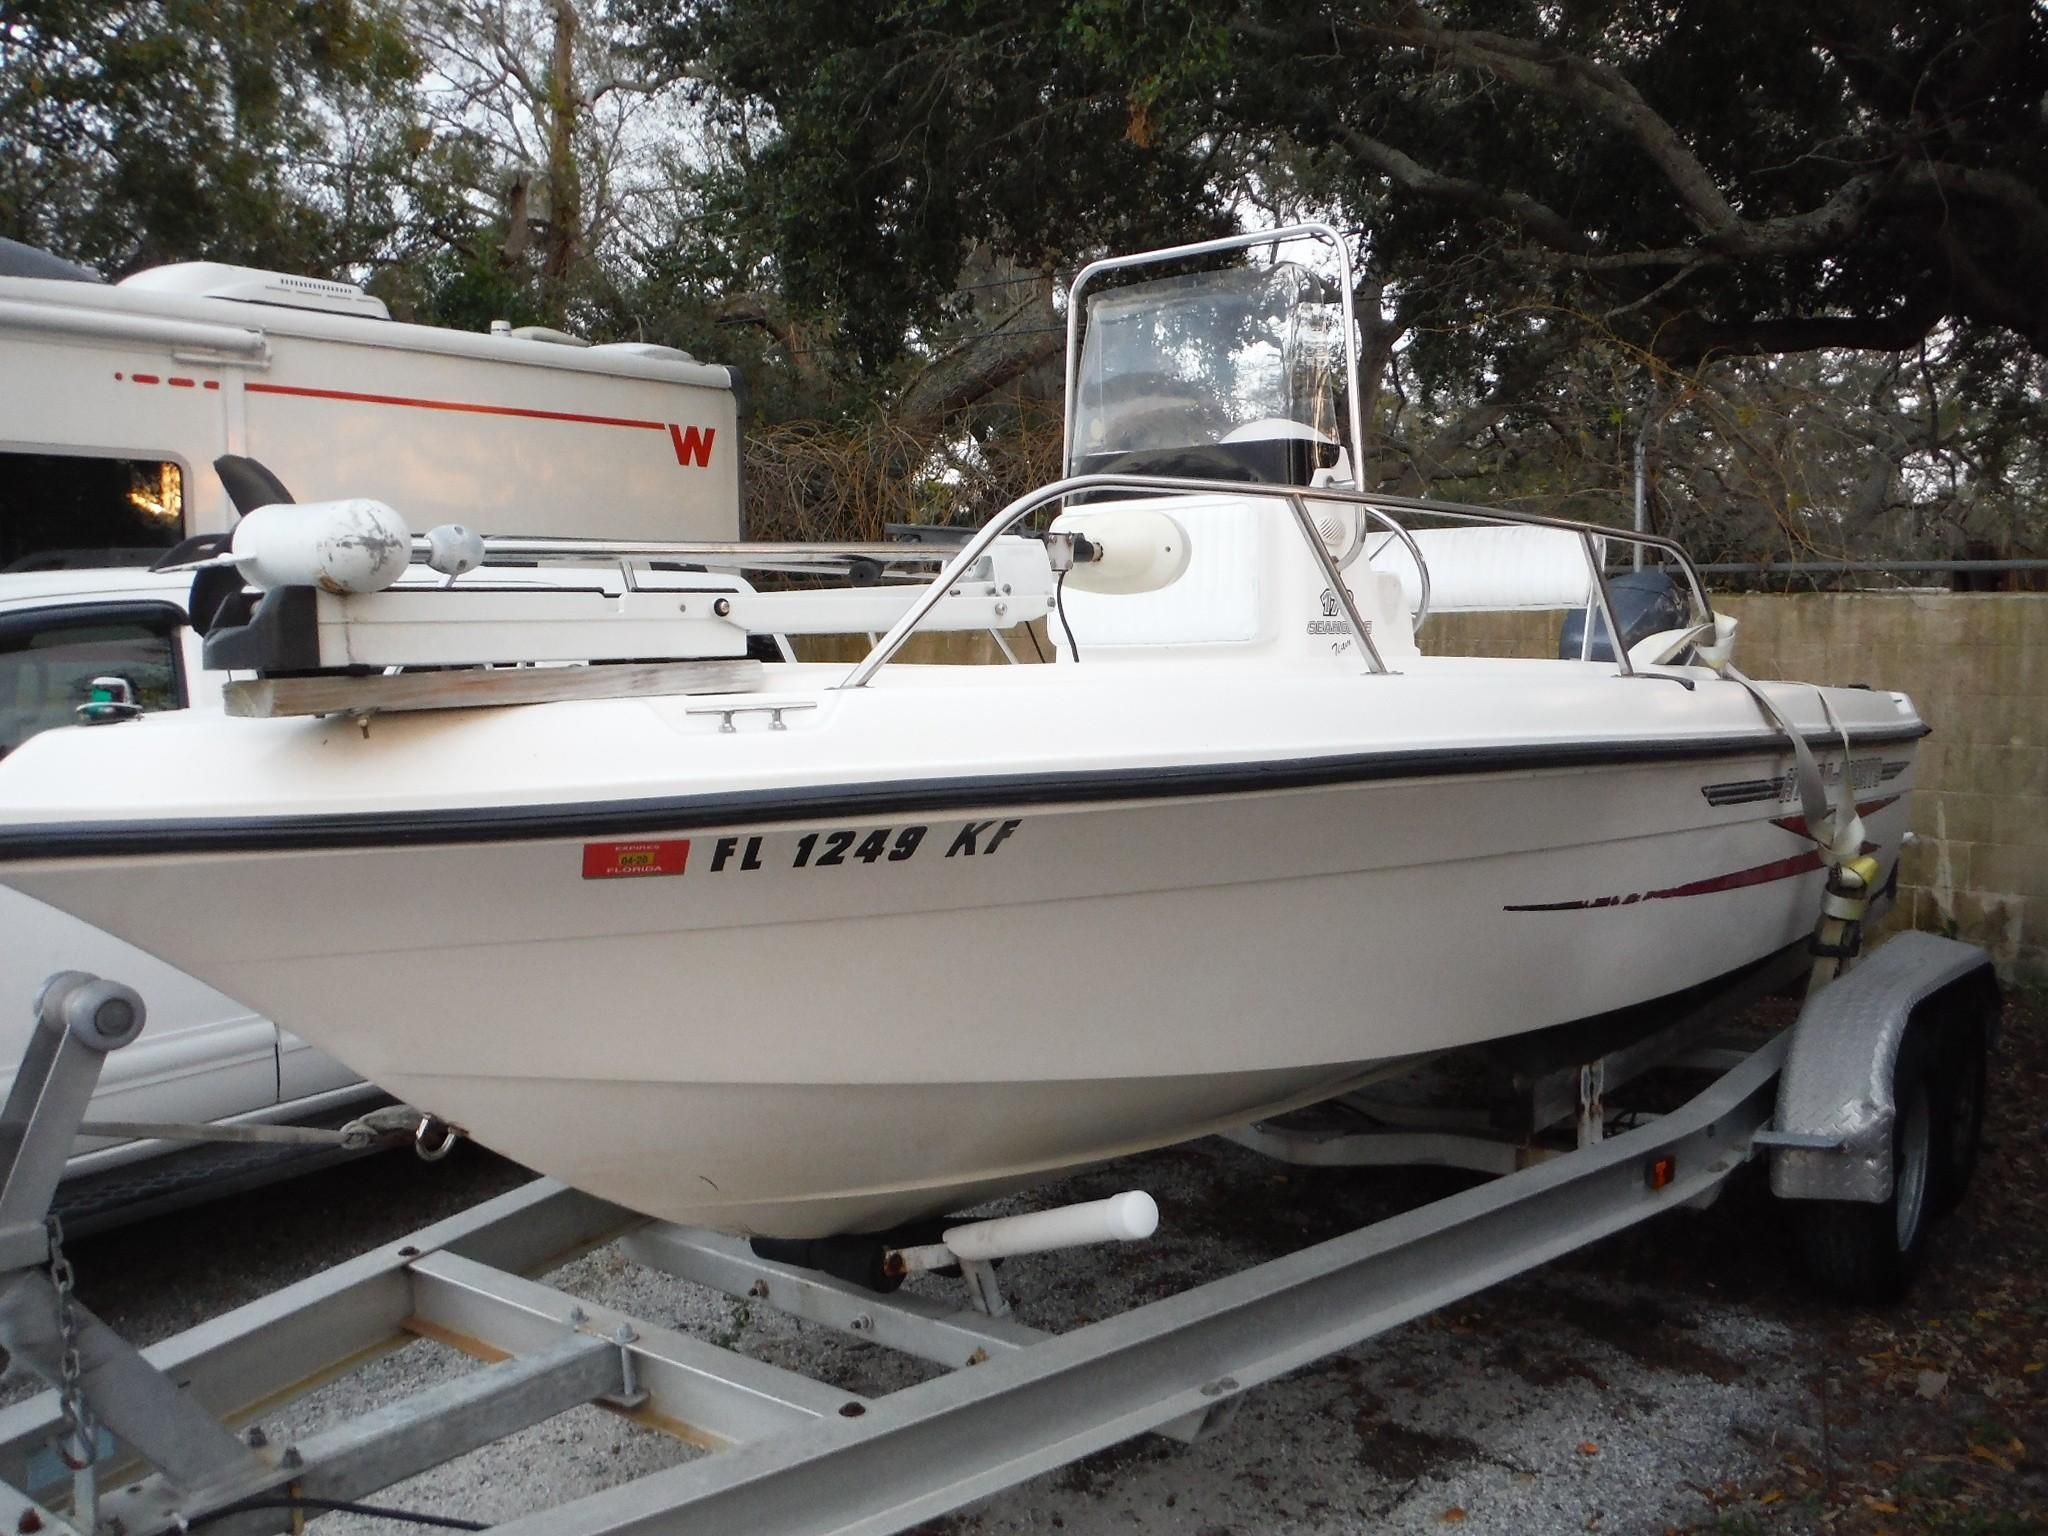 Hydra Sports Boats >> 2001 Hydra-Sports 170 Seahorse CC Power Boat For Sale - www.yachtworld.com